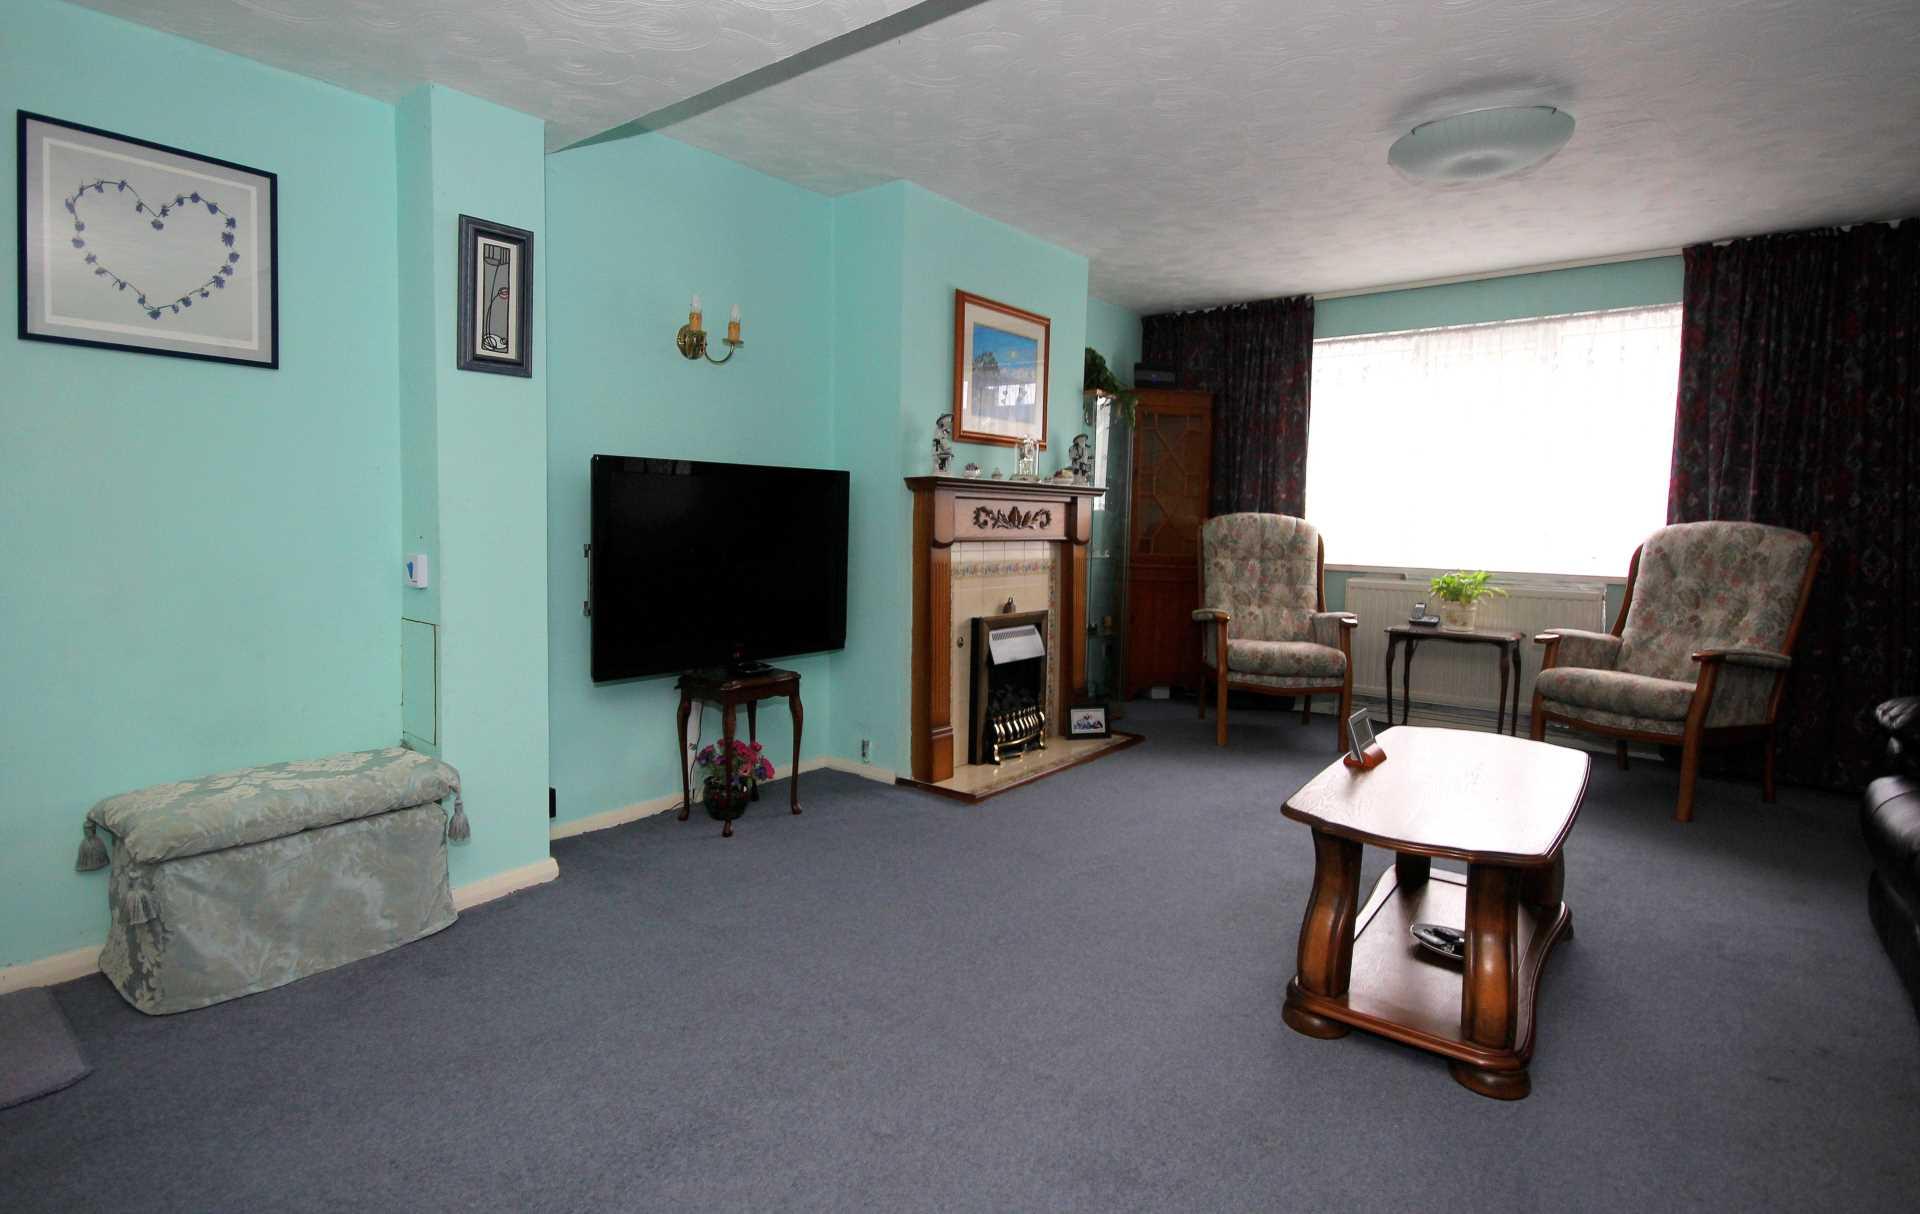 4 bedroom house for sale, Hetchleys, Hemel Hempstead, HP1 3NX ...